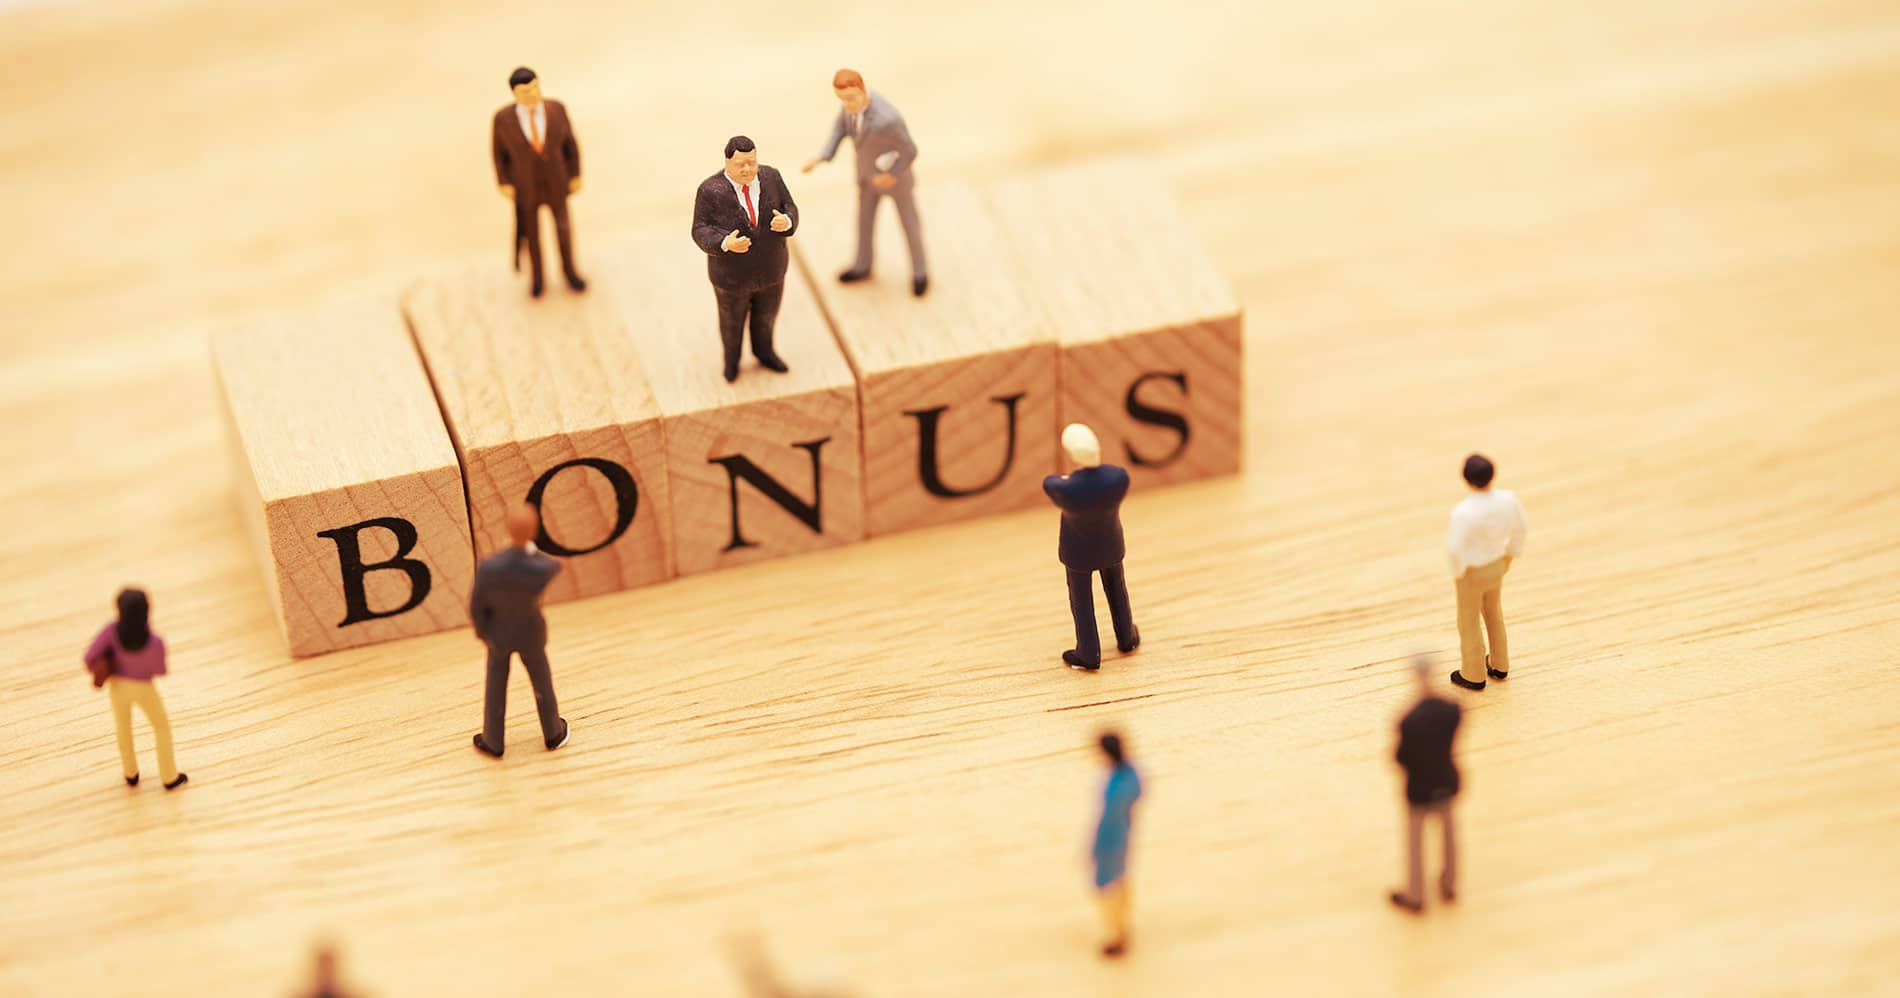 bonus e benefit aziendali: regali ideali